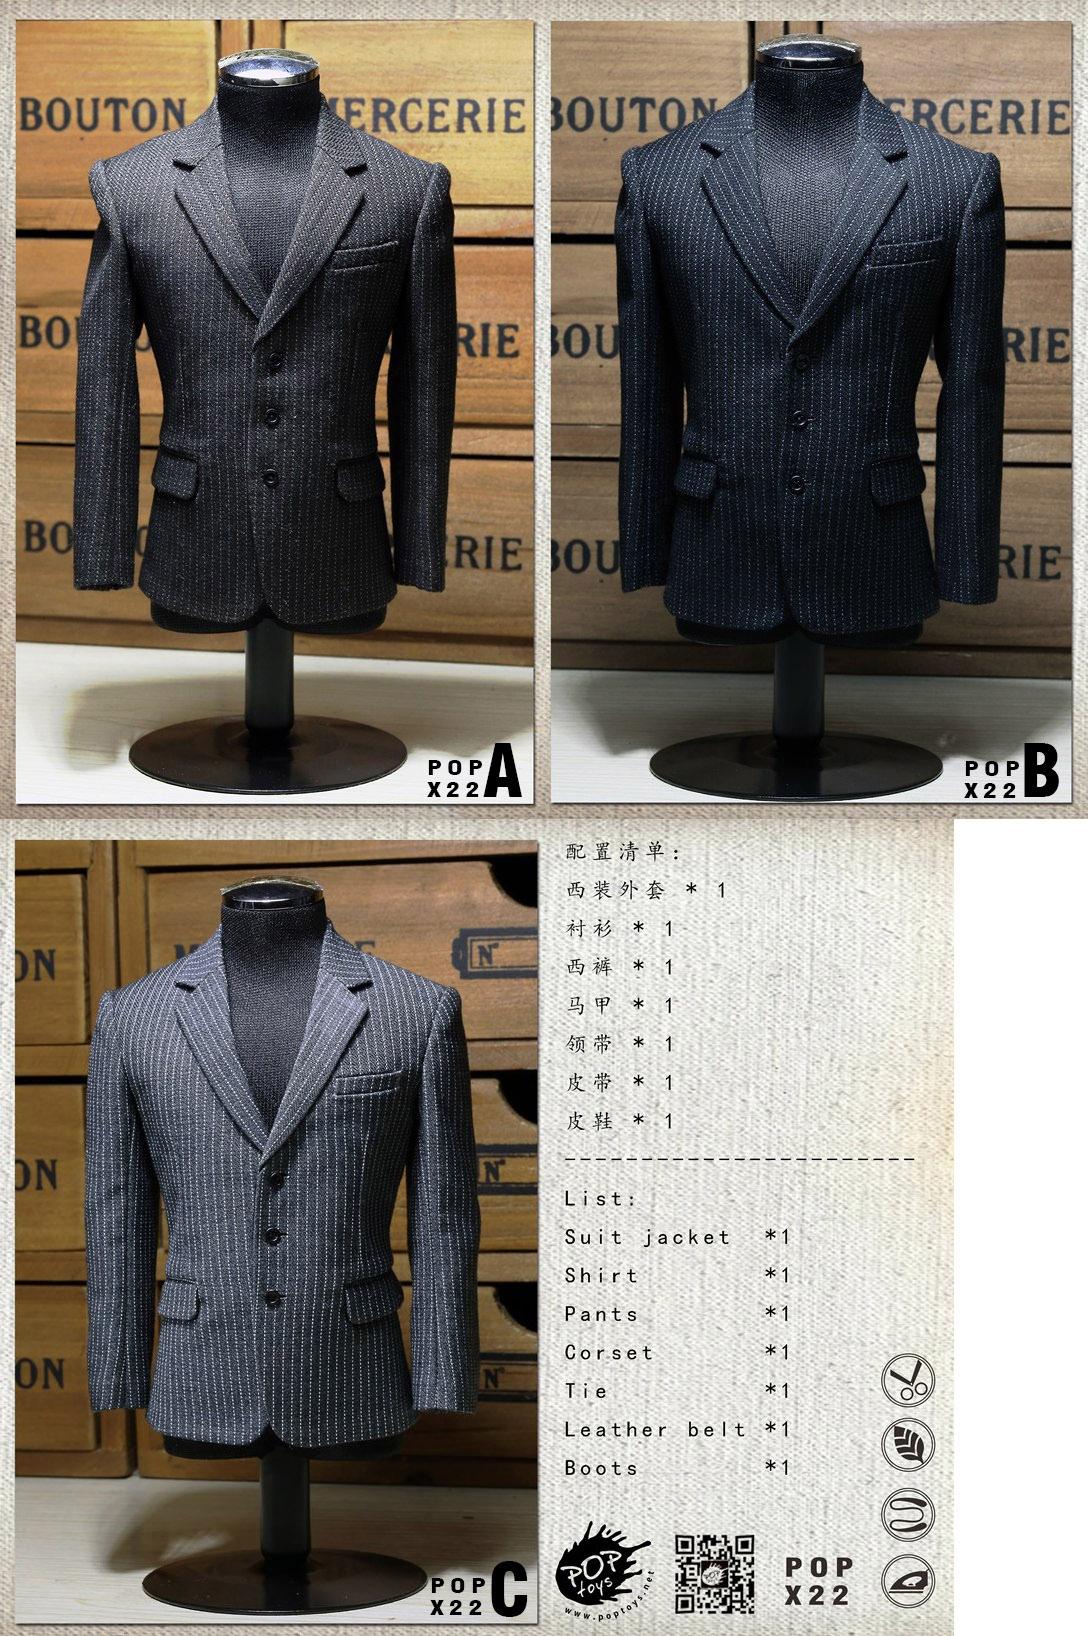 POPTOYS X22 1/6 Style Series - Men's striped Suit X3 colours